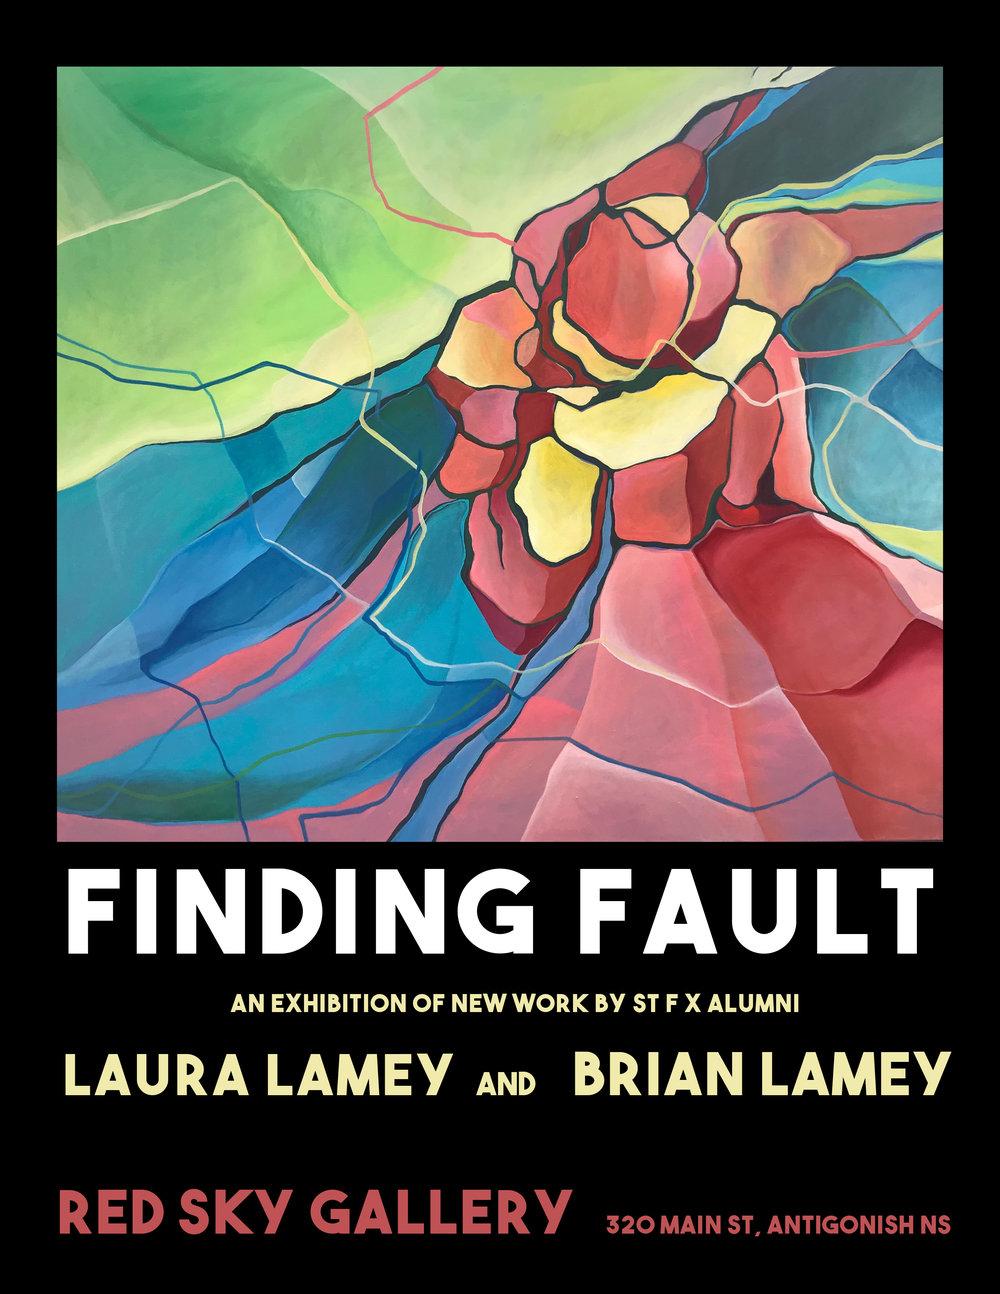 finding fault poster.jpg